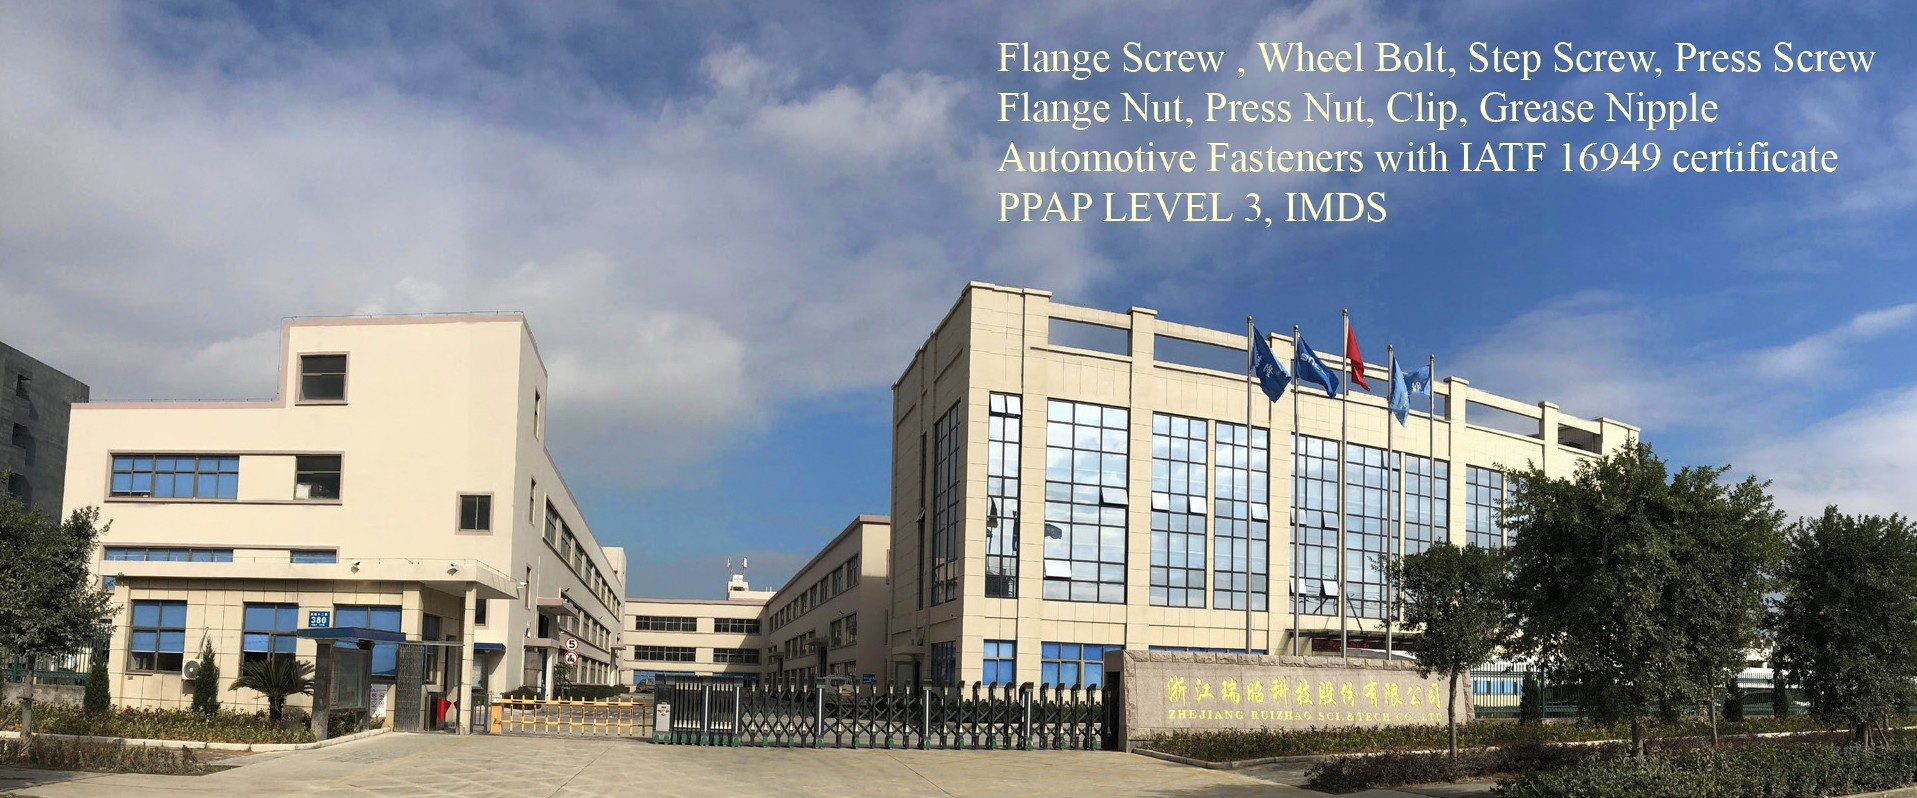 Flange screw press screw wheel bolt flange nut automotive fasteners